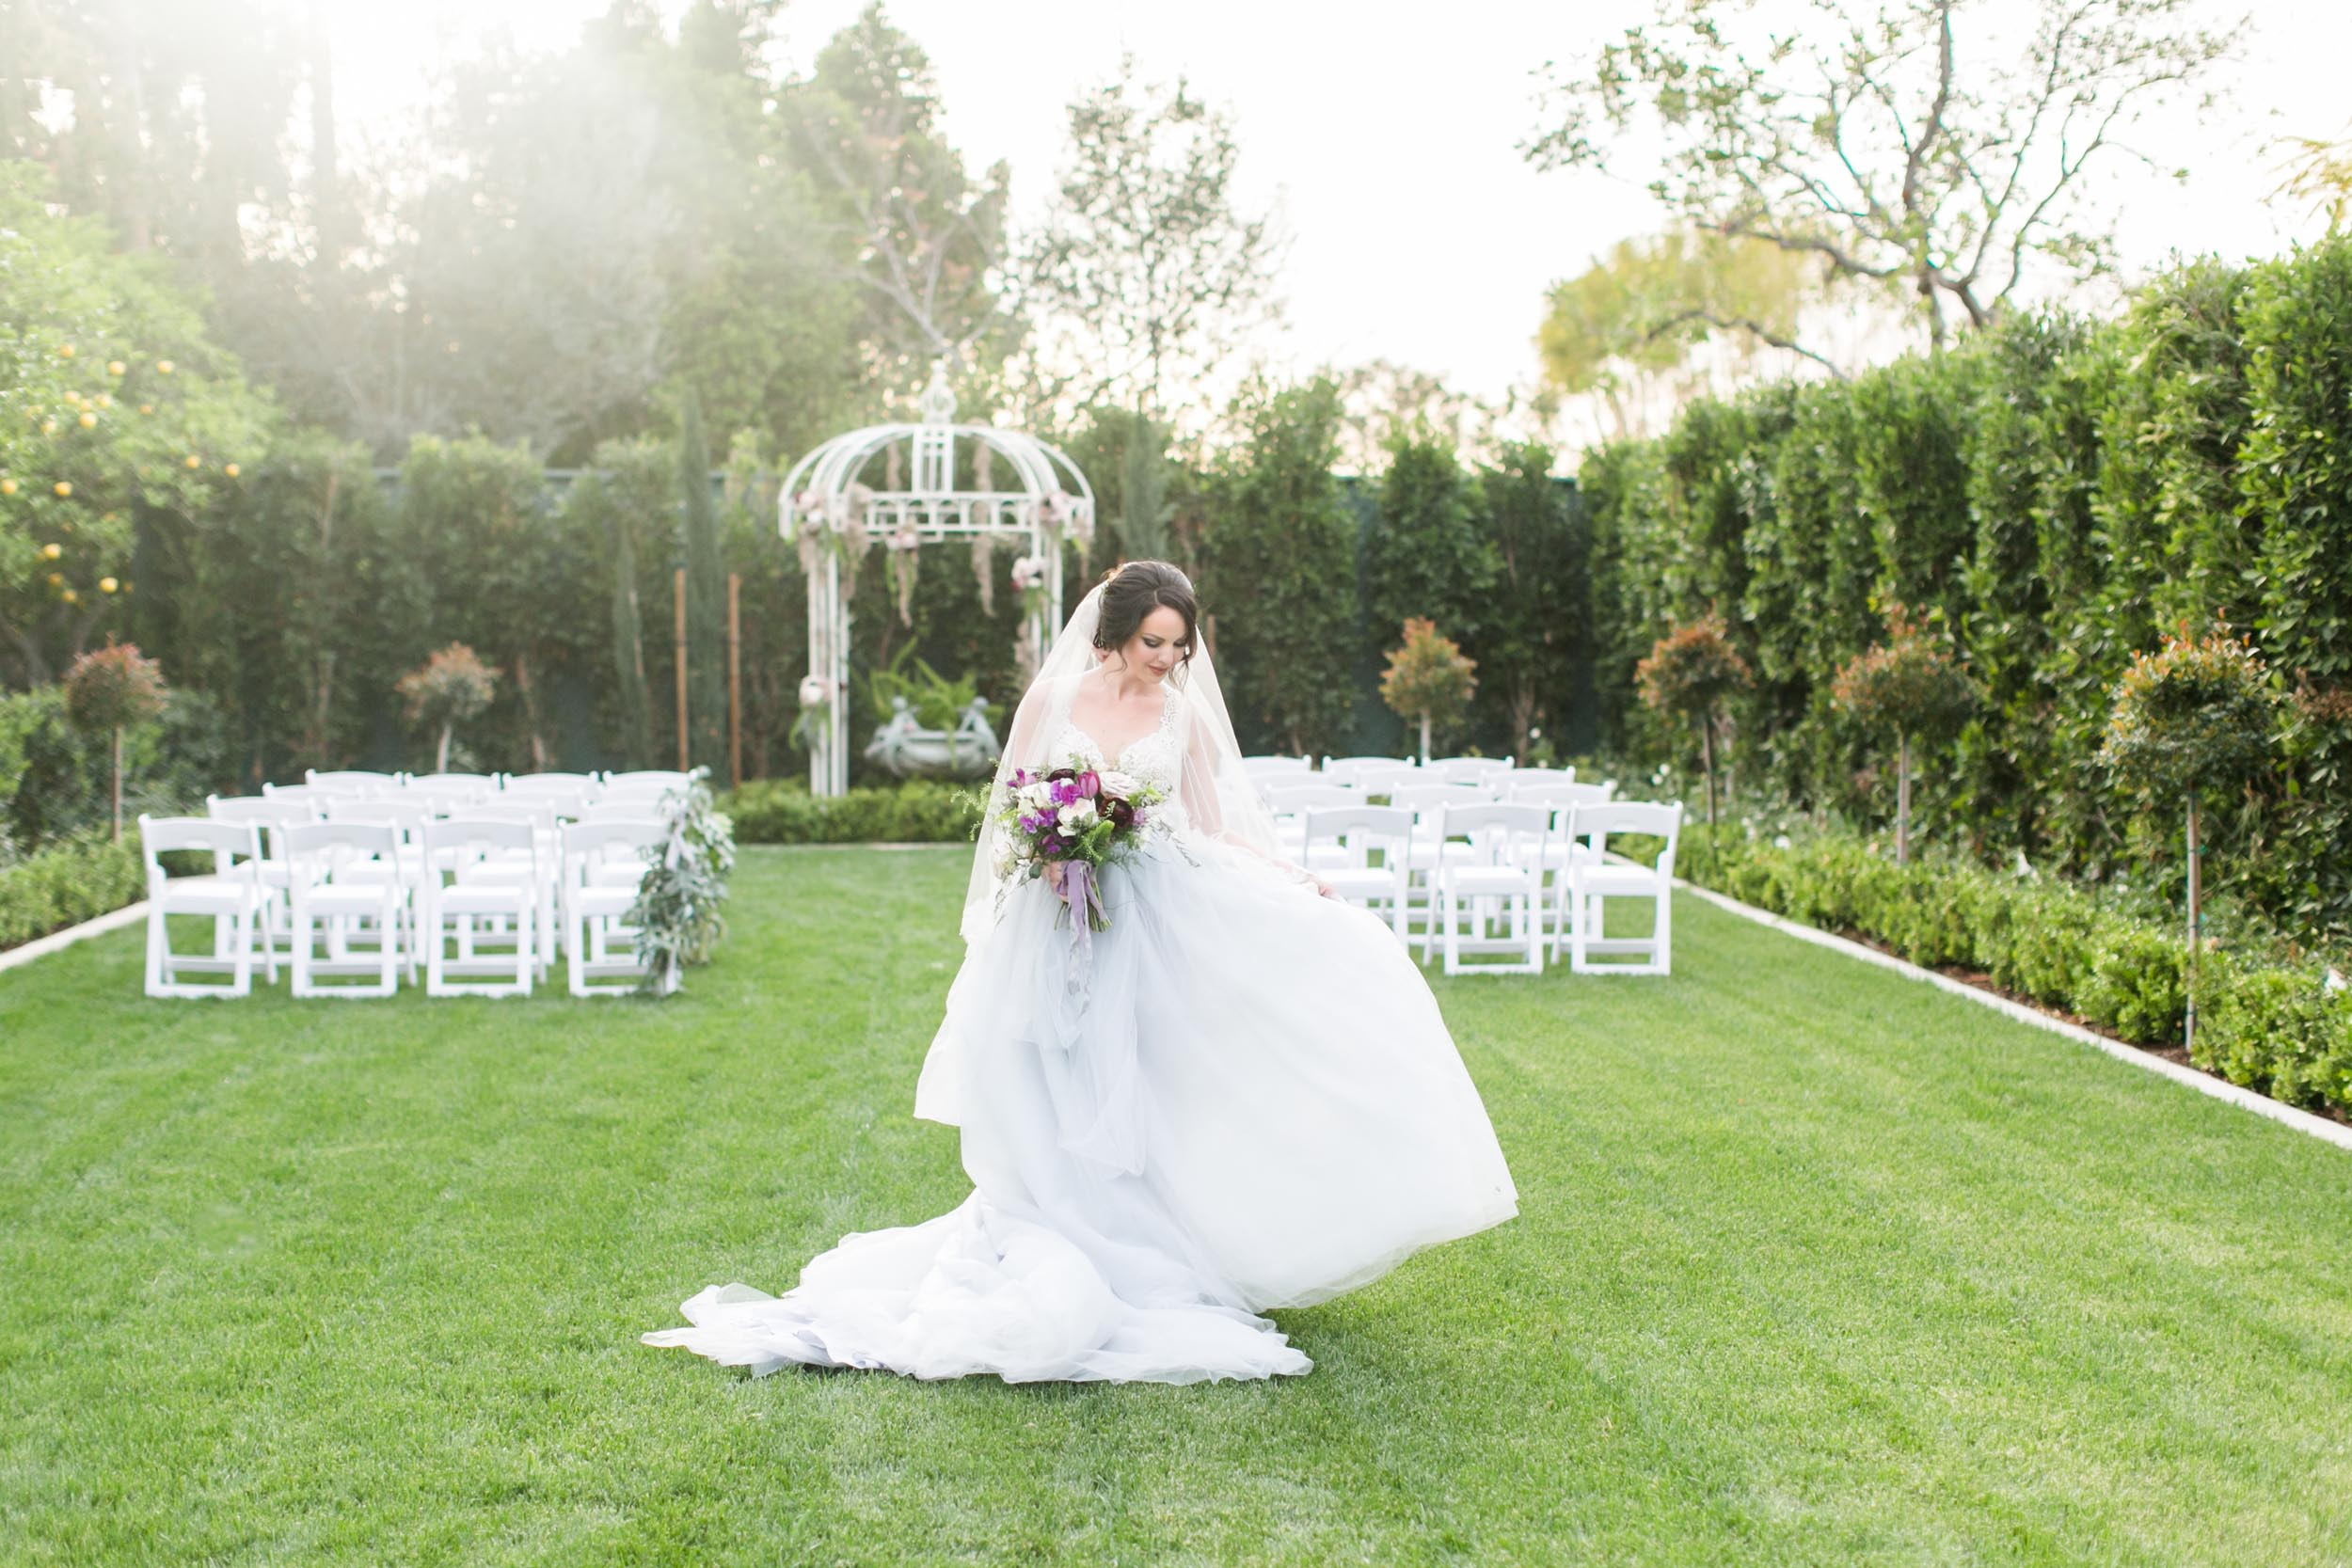 christmas-house-wedding-venue-white-garden-bridal-portraits-carrie-vines-098.jpg